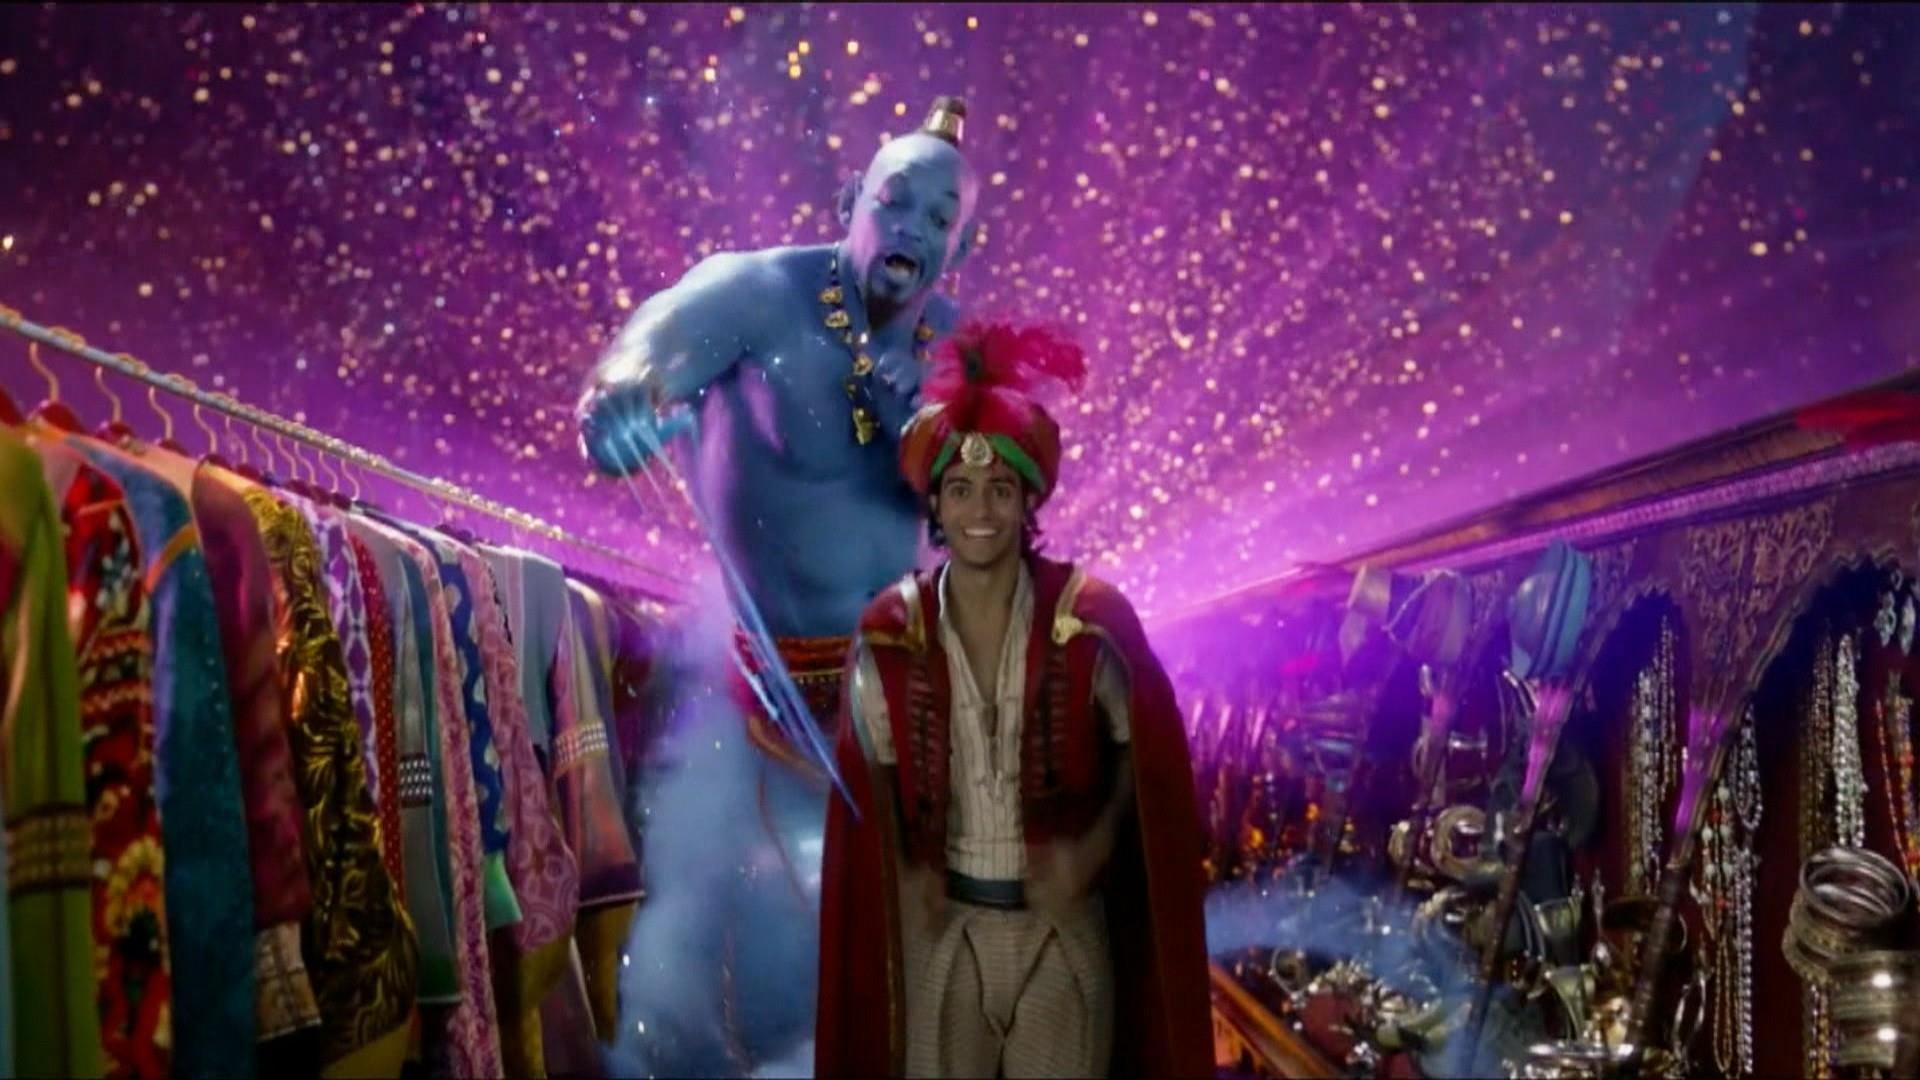 Will Smith shares how he filmed 'Friend Like Me' scene for 'Aladdin'